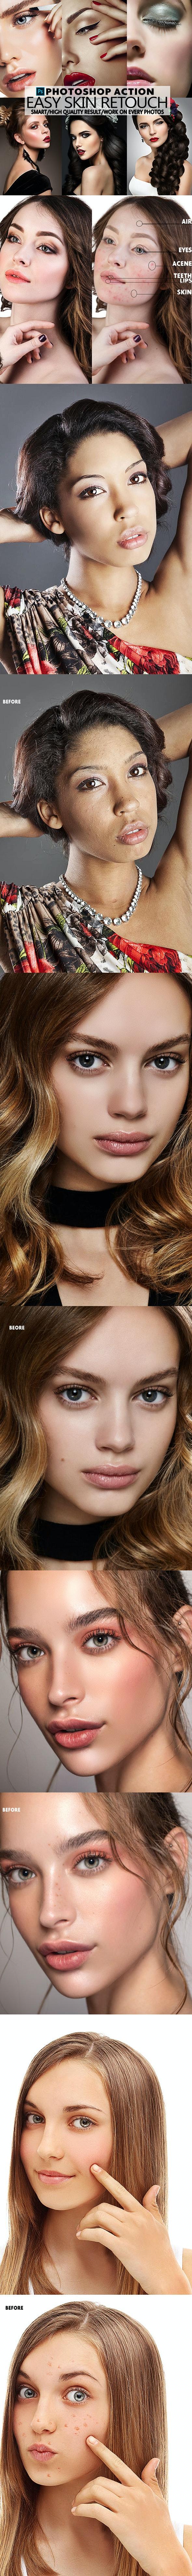 Easy Skin Photoshop - Actions Photoshop